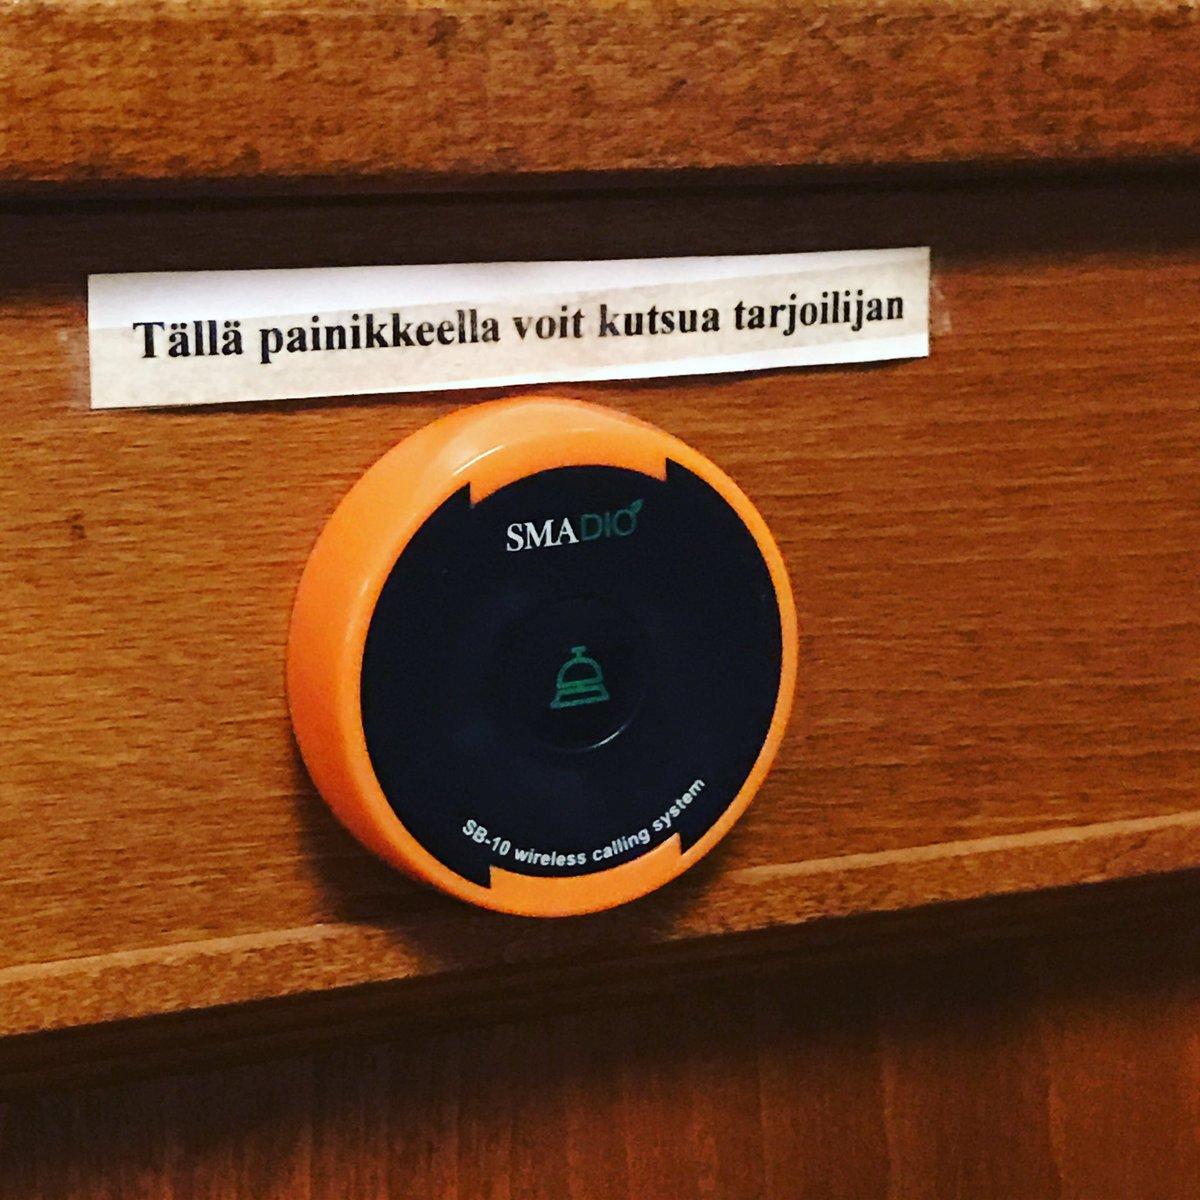 Photo by: TuomasEnbuske